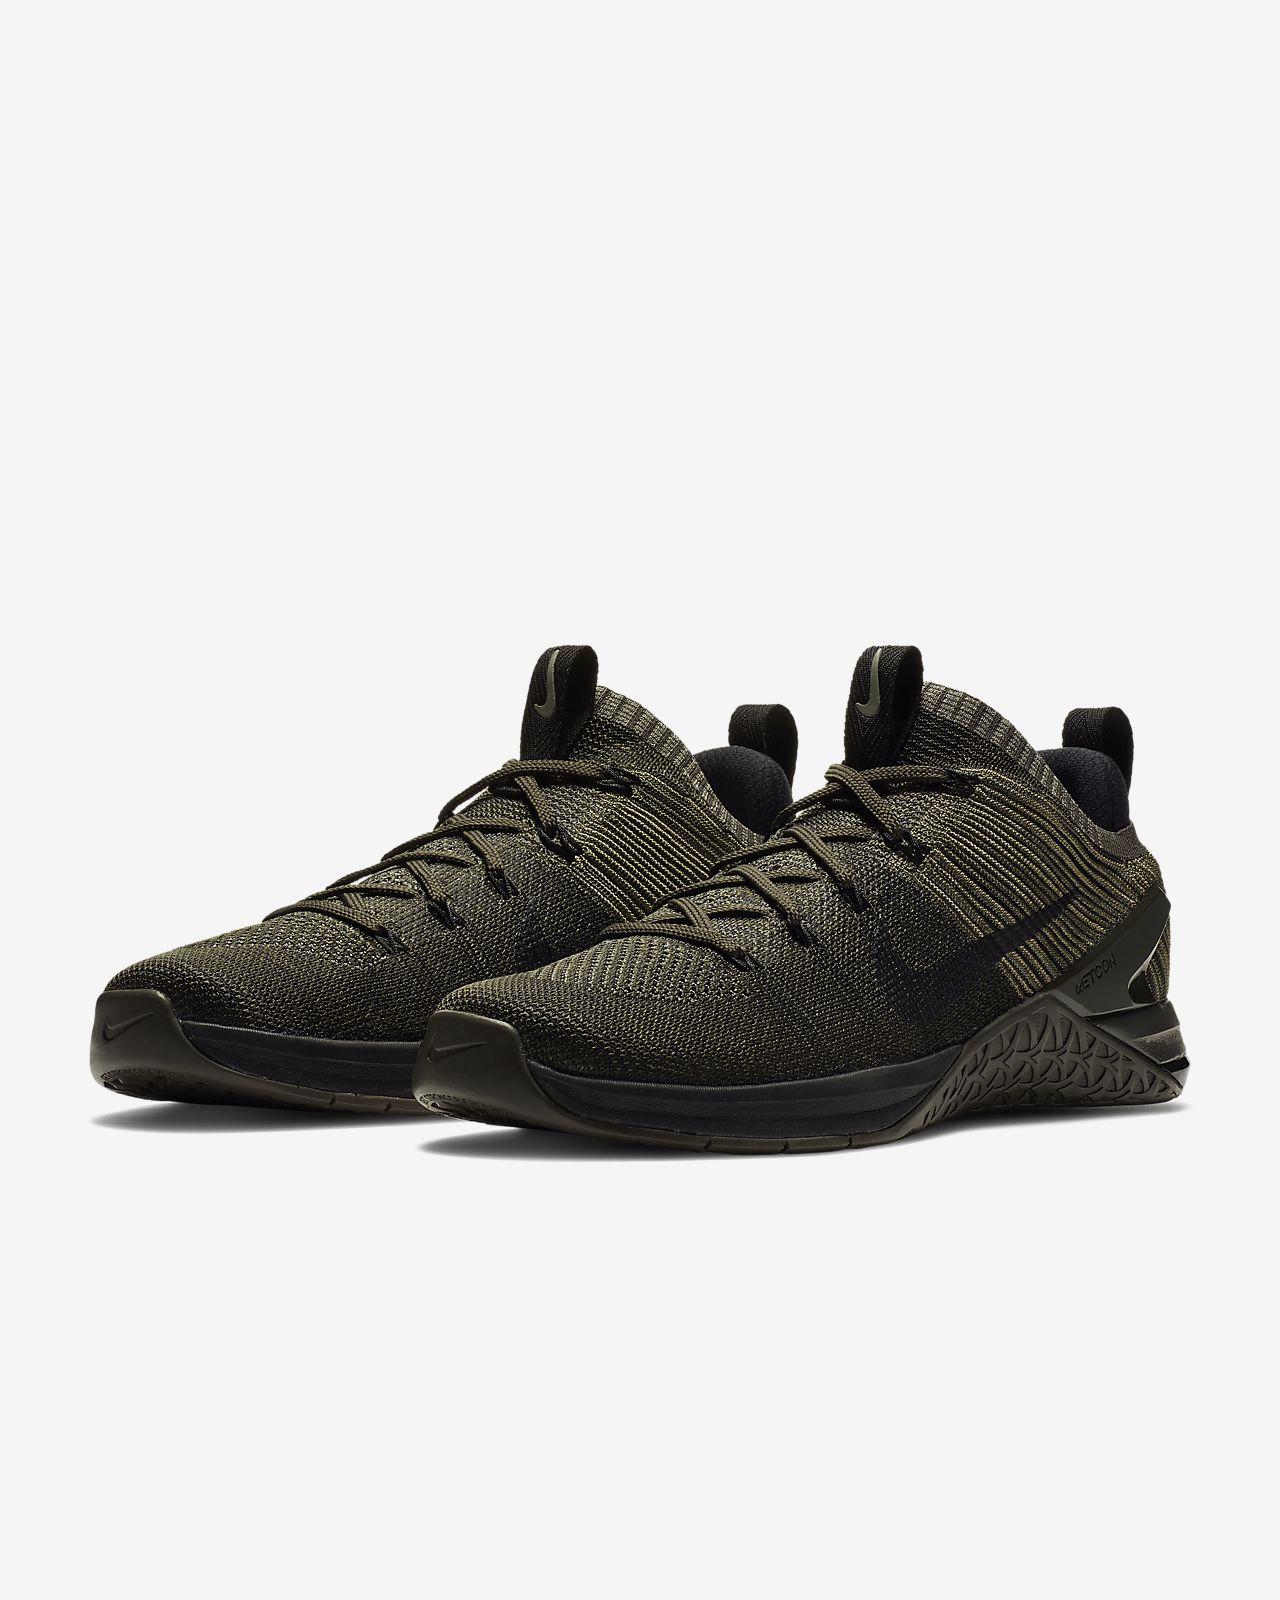 4364afb521 ... Nike Metcon DSX Flyknit 2 Men's Cross Training/Weightlifting Shoe